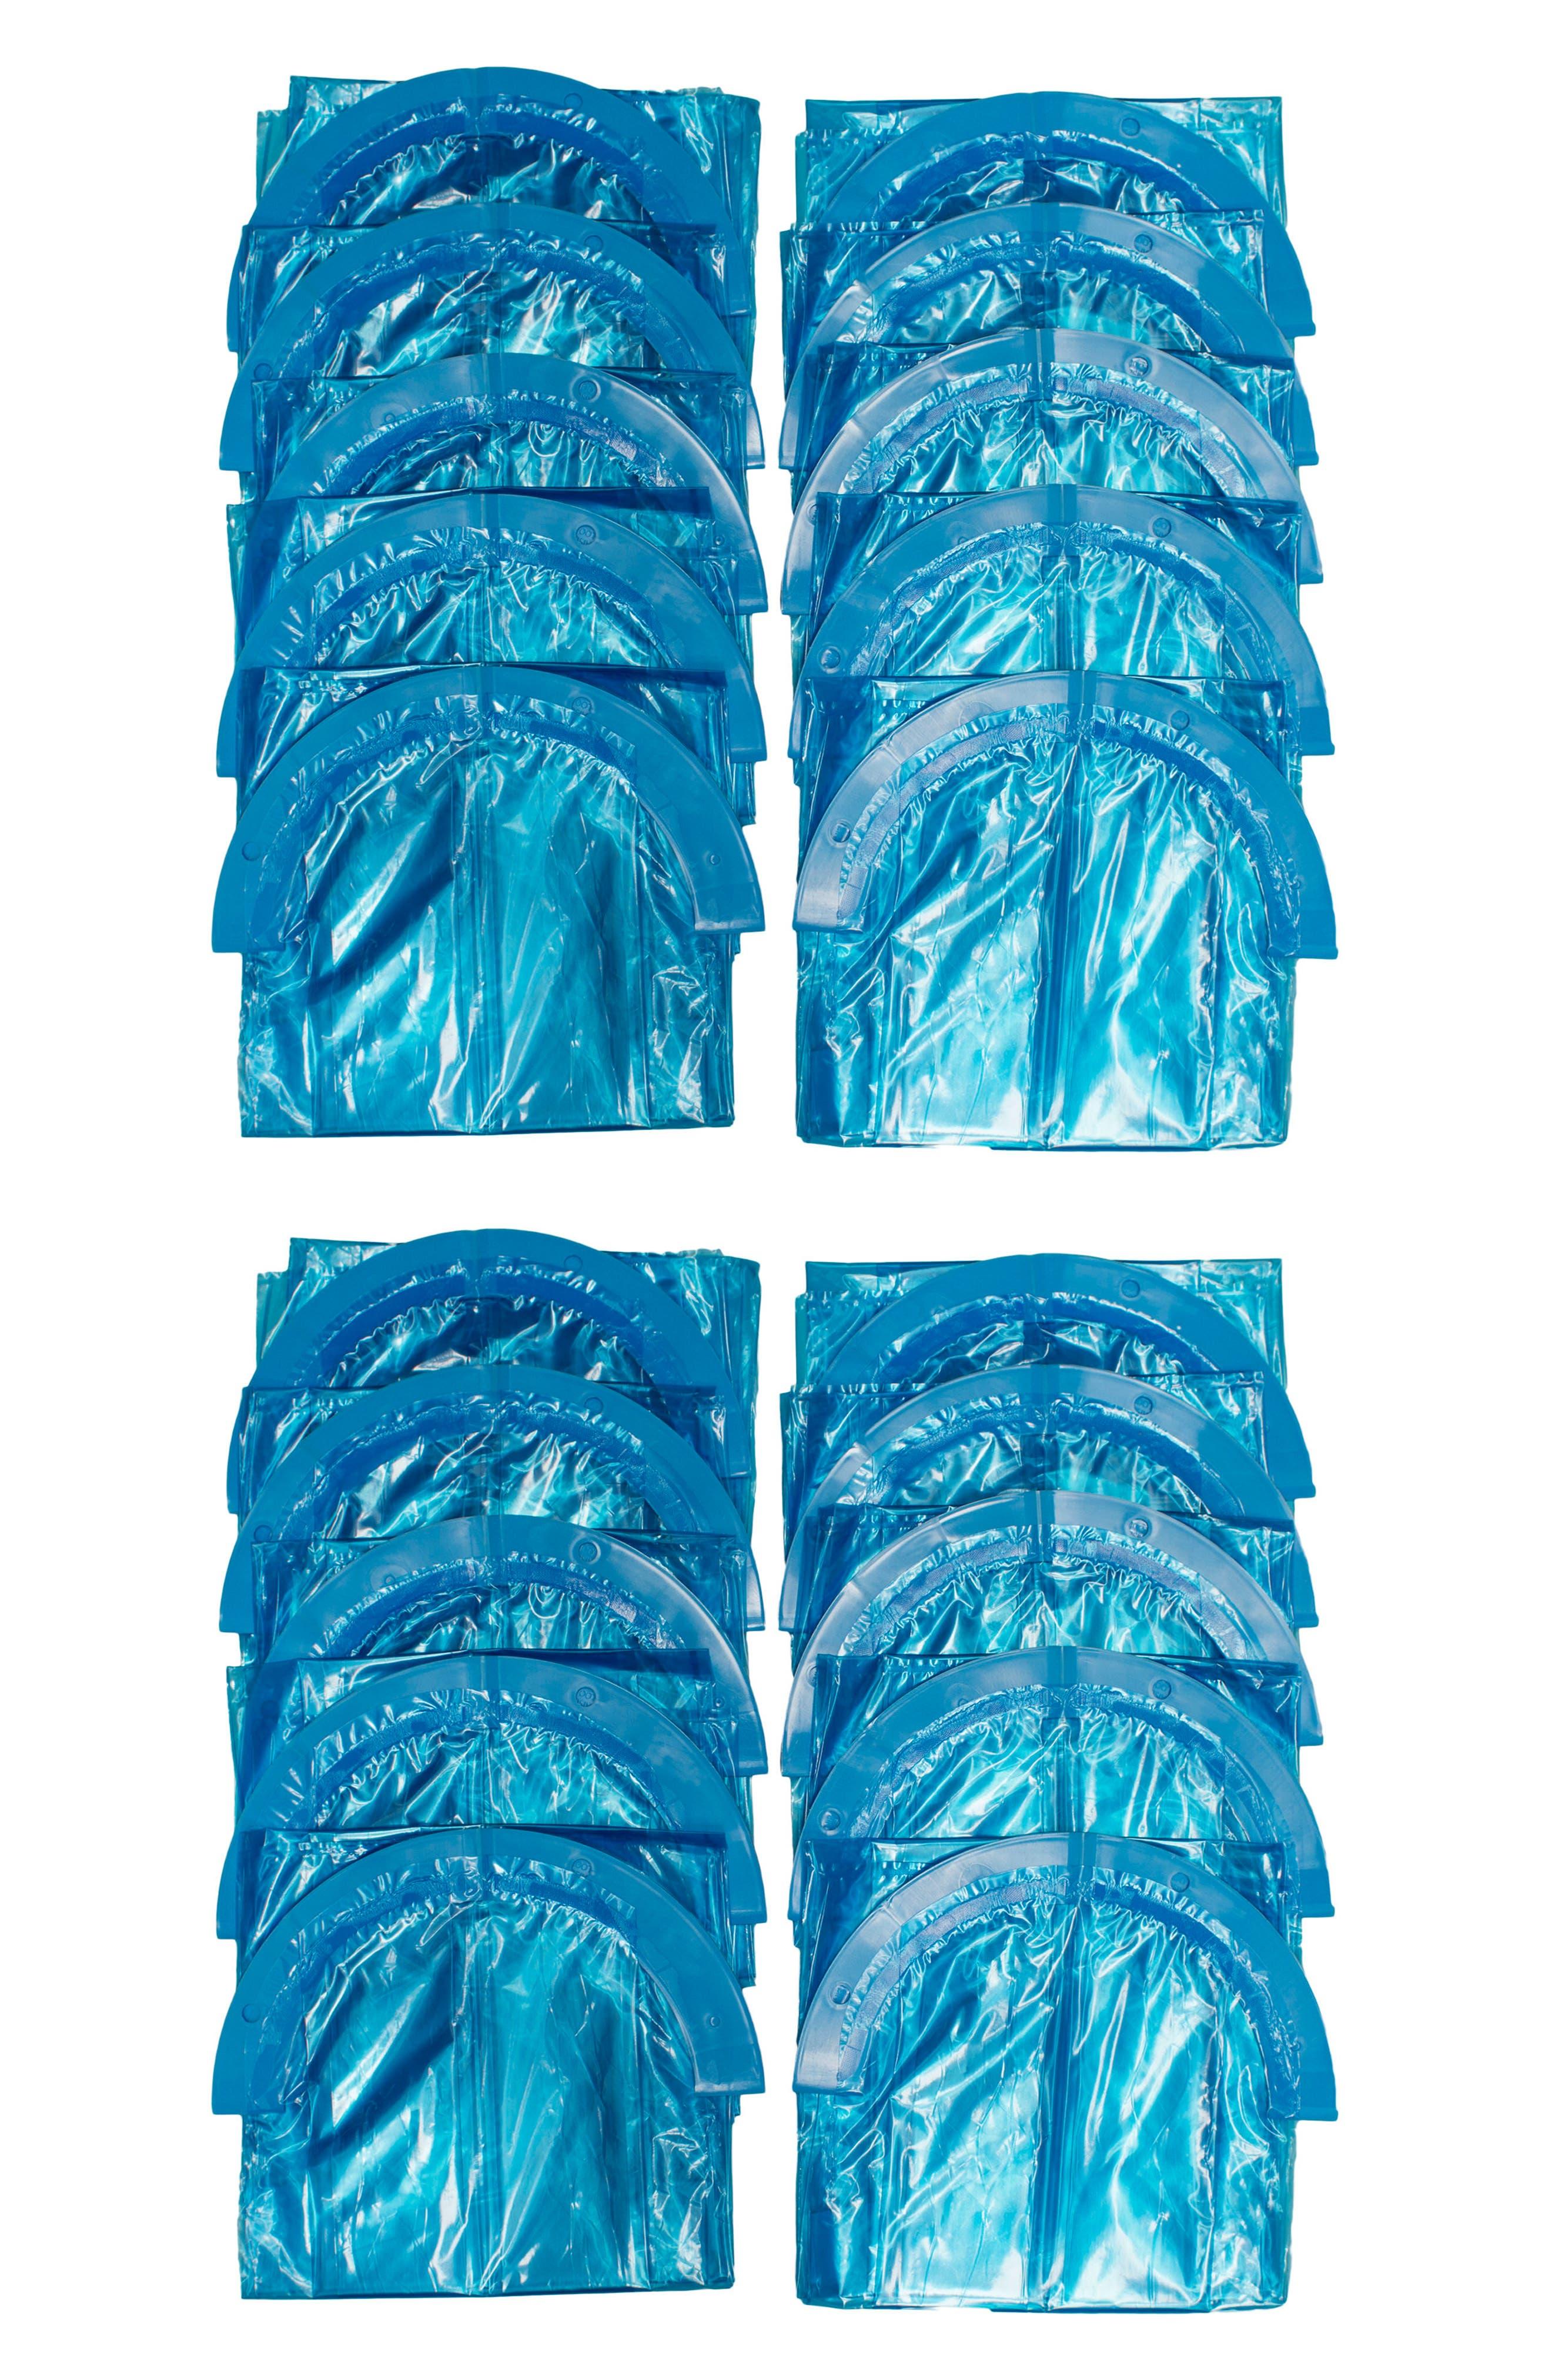 Twist'r Diaper Disposal System Set of 20 Refill Bags,                             Main thumbnail 1, color,